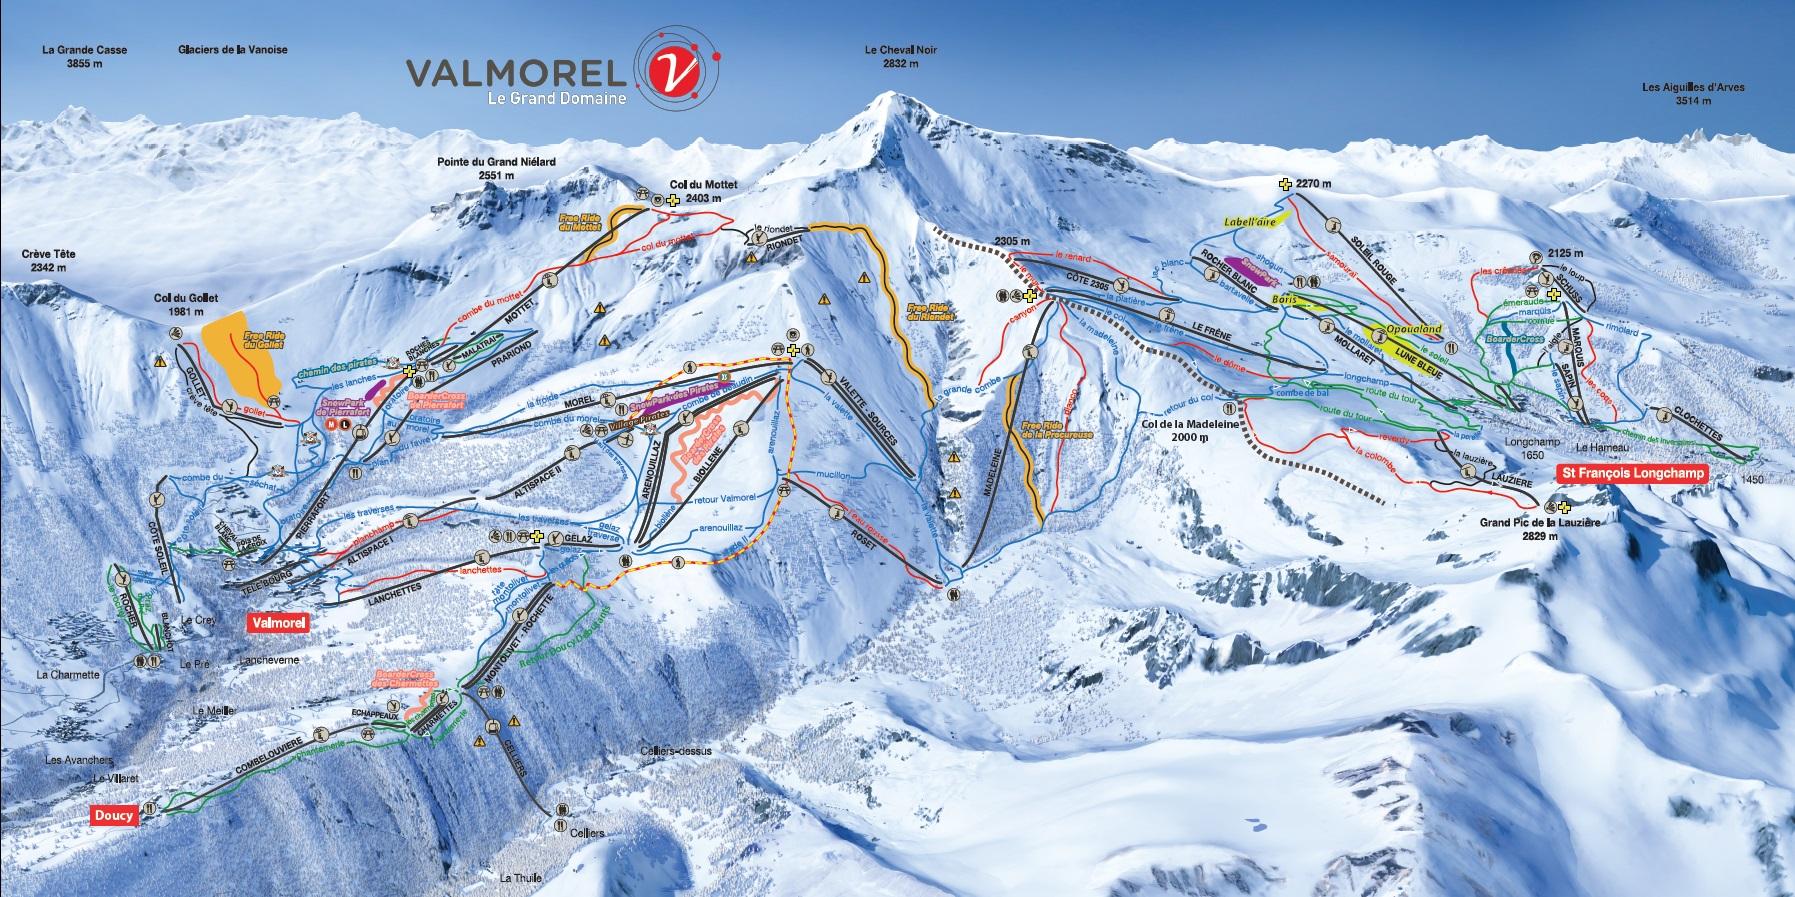 Plan des pistes Valmorel 2018-2019